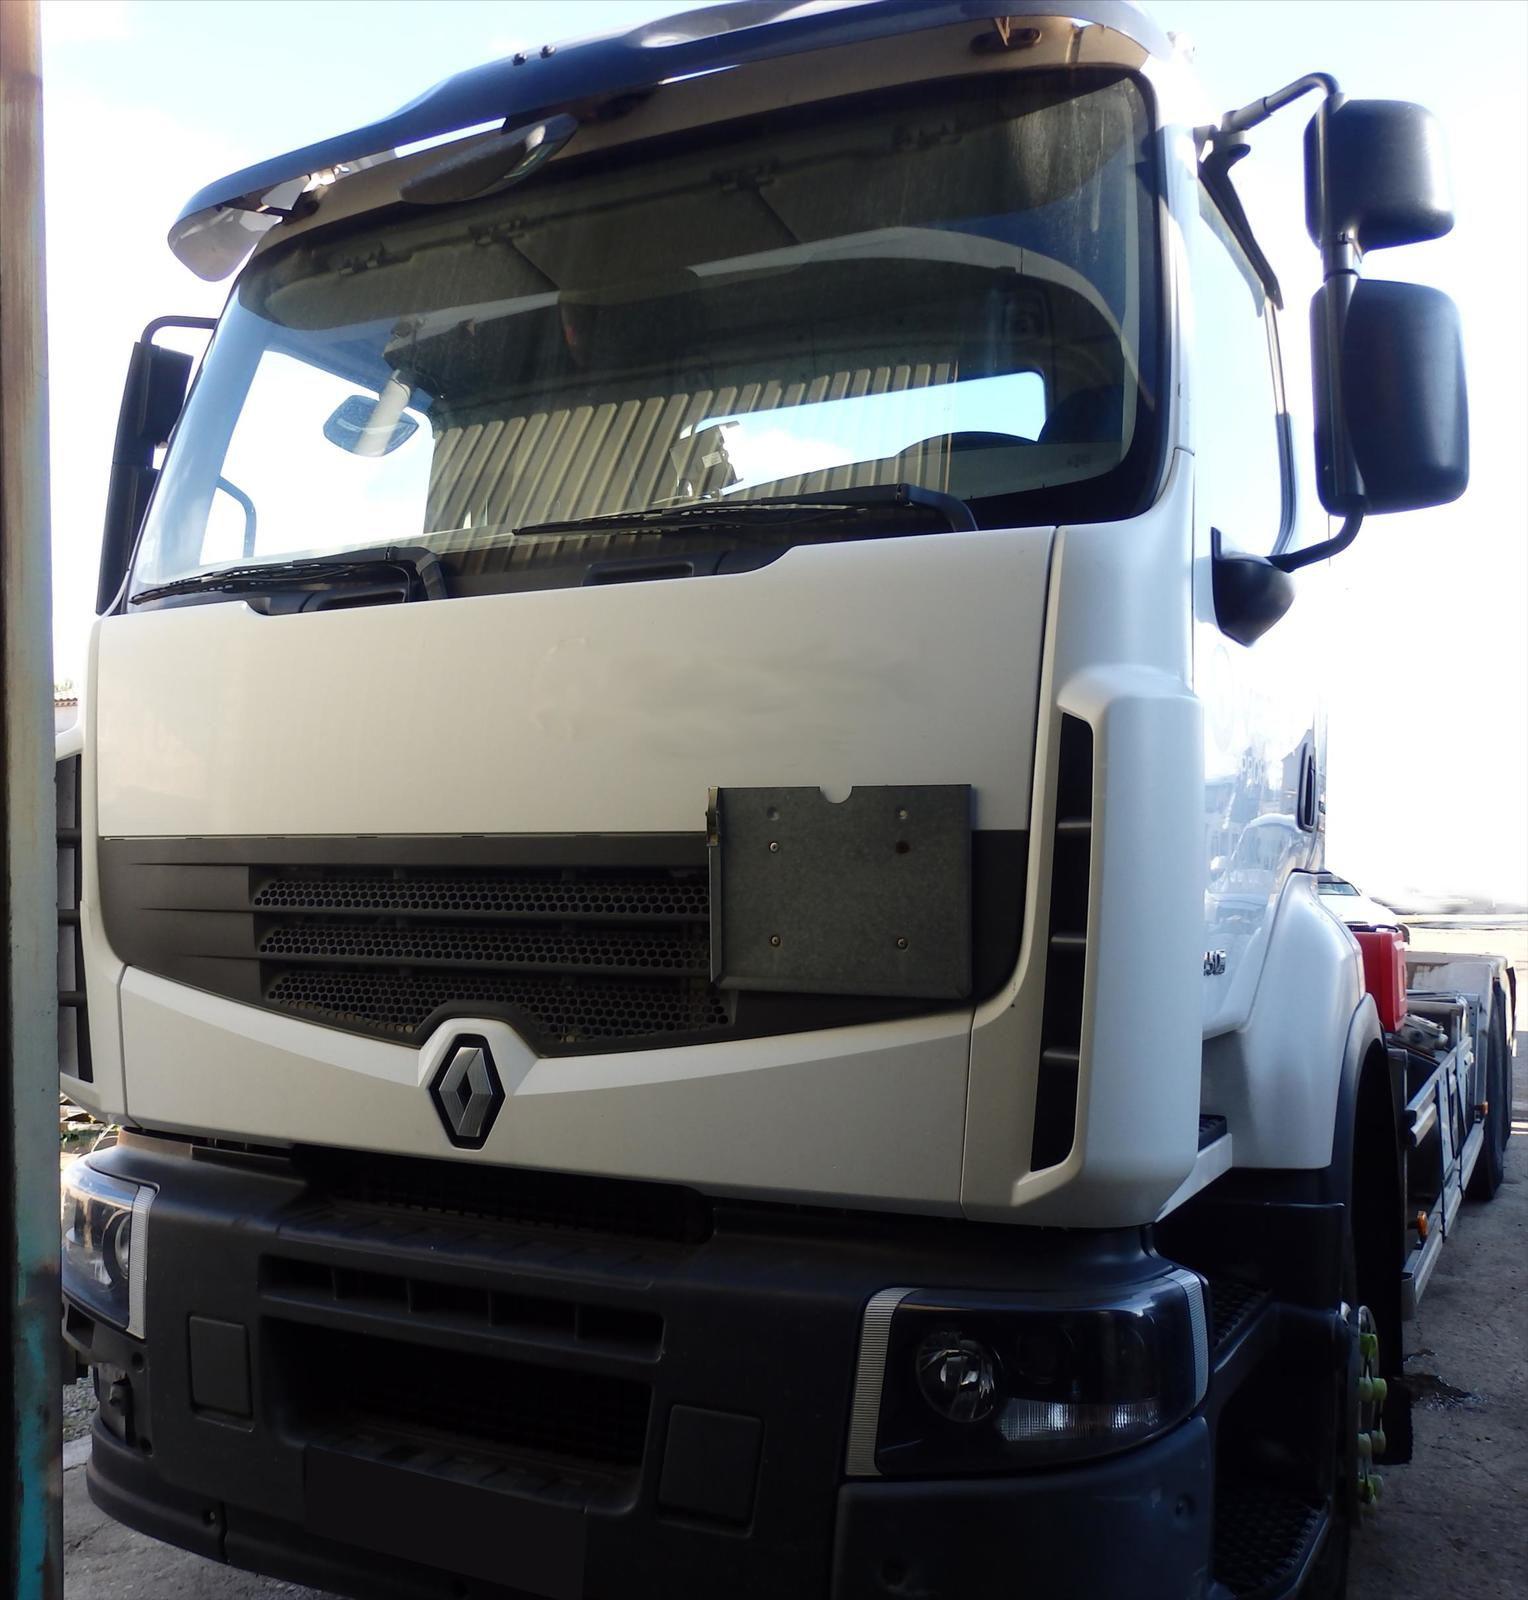 Camion Ampliroll Empirolle 6x2 Renault Premium Lander 450 Tel: 0608066192 TRANSCOMM13 Pierre BASSAT